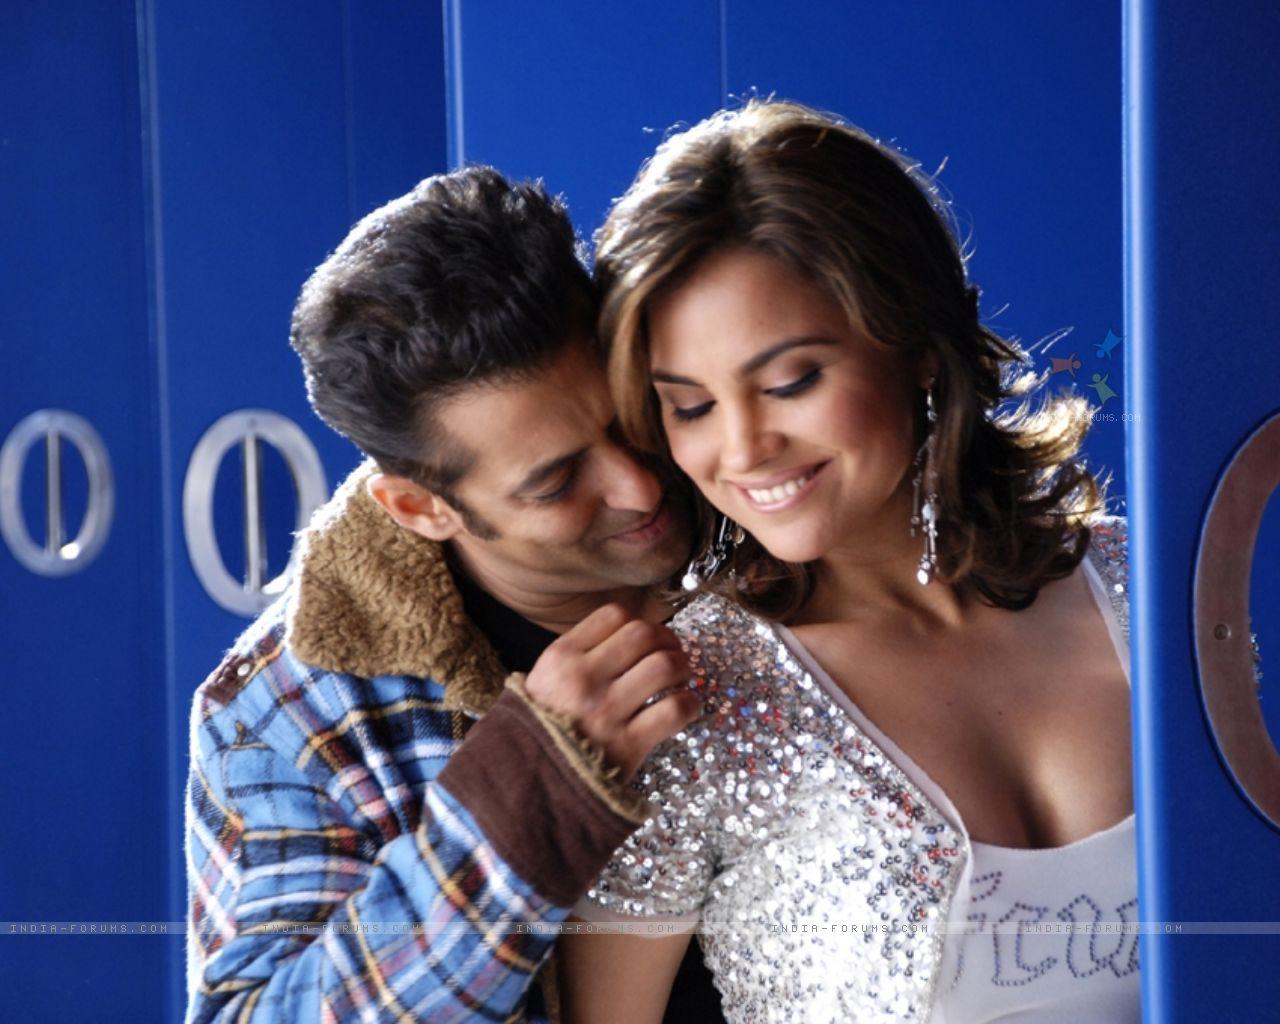 http://2.bp.blogspot.com/_o2Y9aZ2qaT8/TCgtpkbtcYI/AAAAAAAACpk/0MWPOhDZ9CE/s1600/11409-romantic-scene-of-salman-khan-and-lara-dutta.jpg